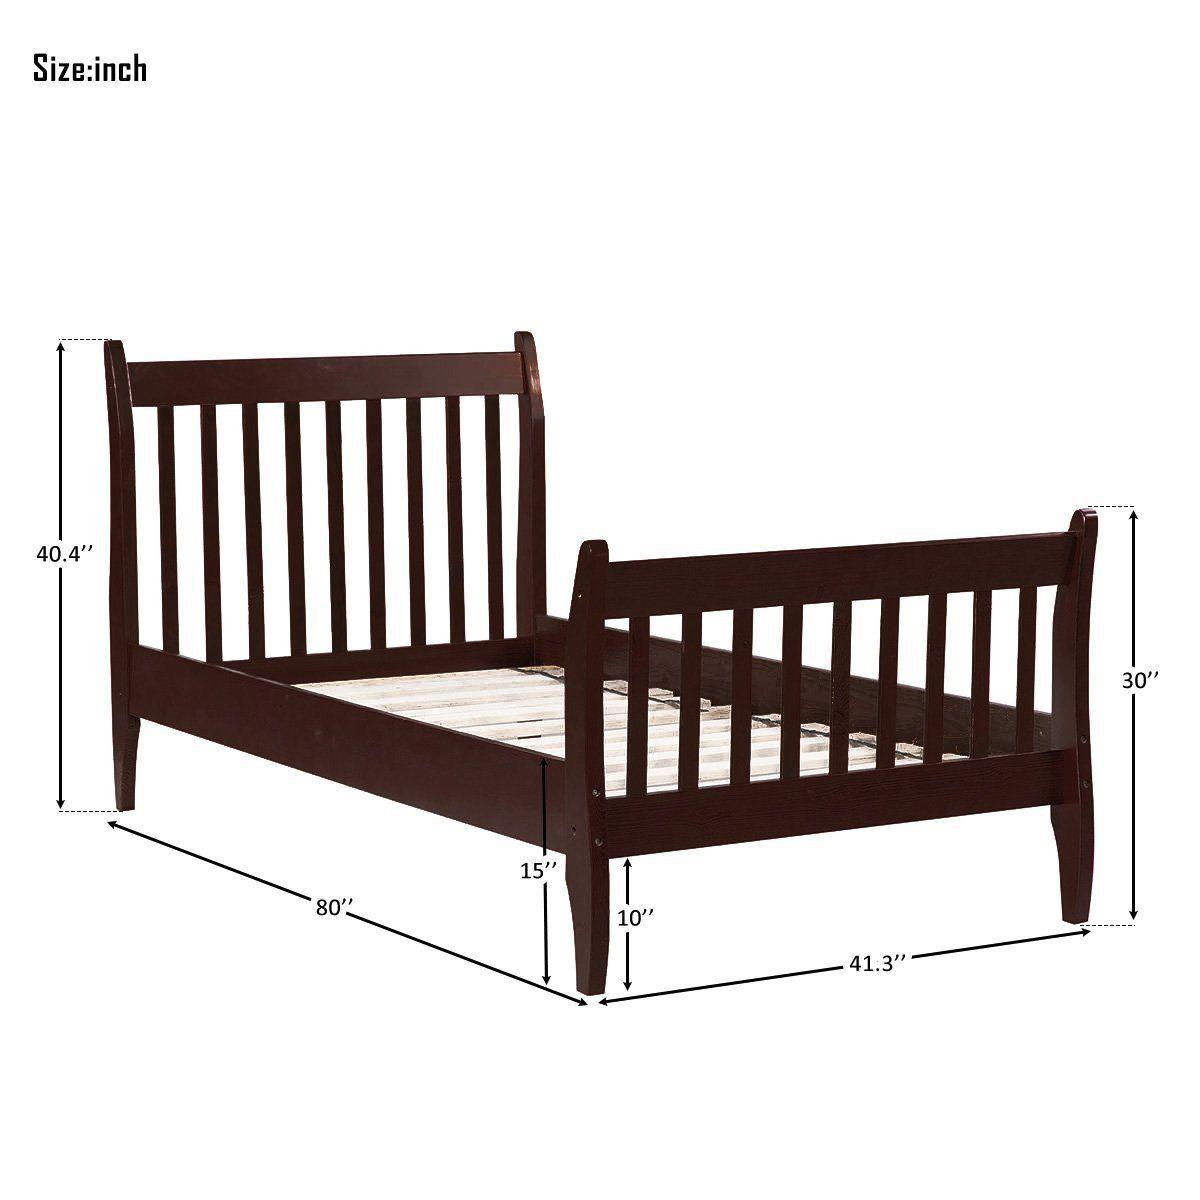 Bed Frame Twin Dark Wood OakJULYFOX Modern White Bed Frame And